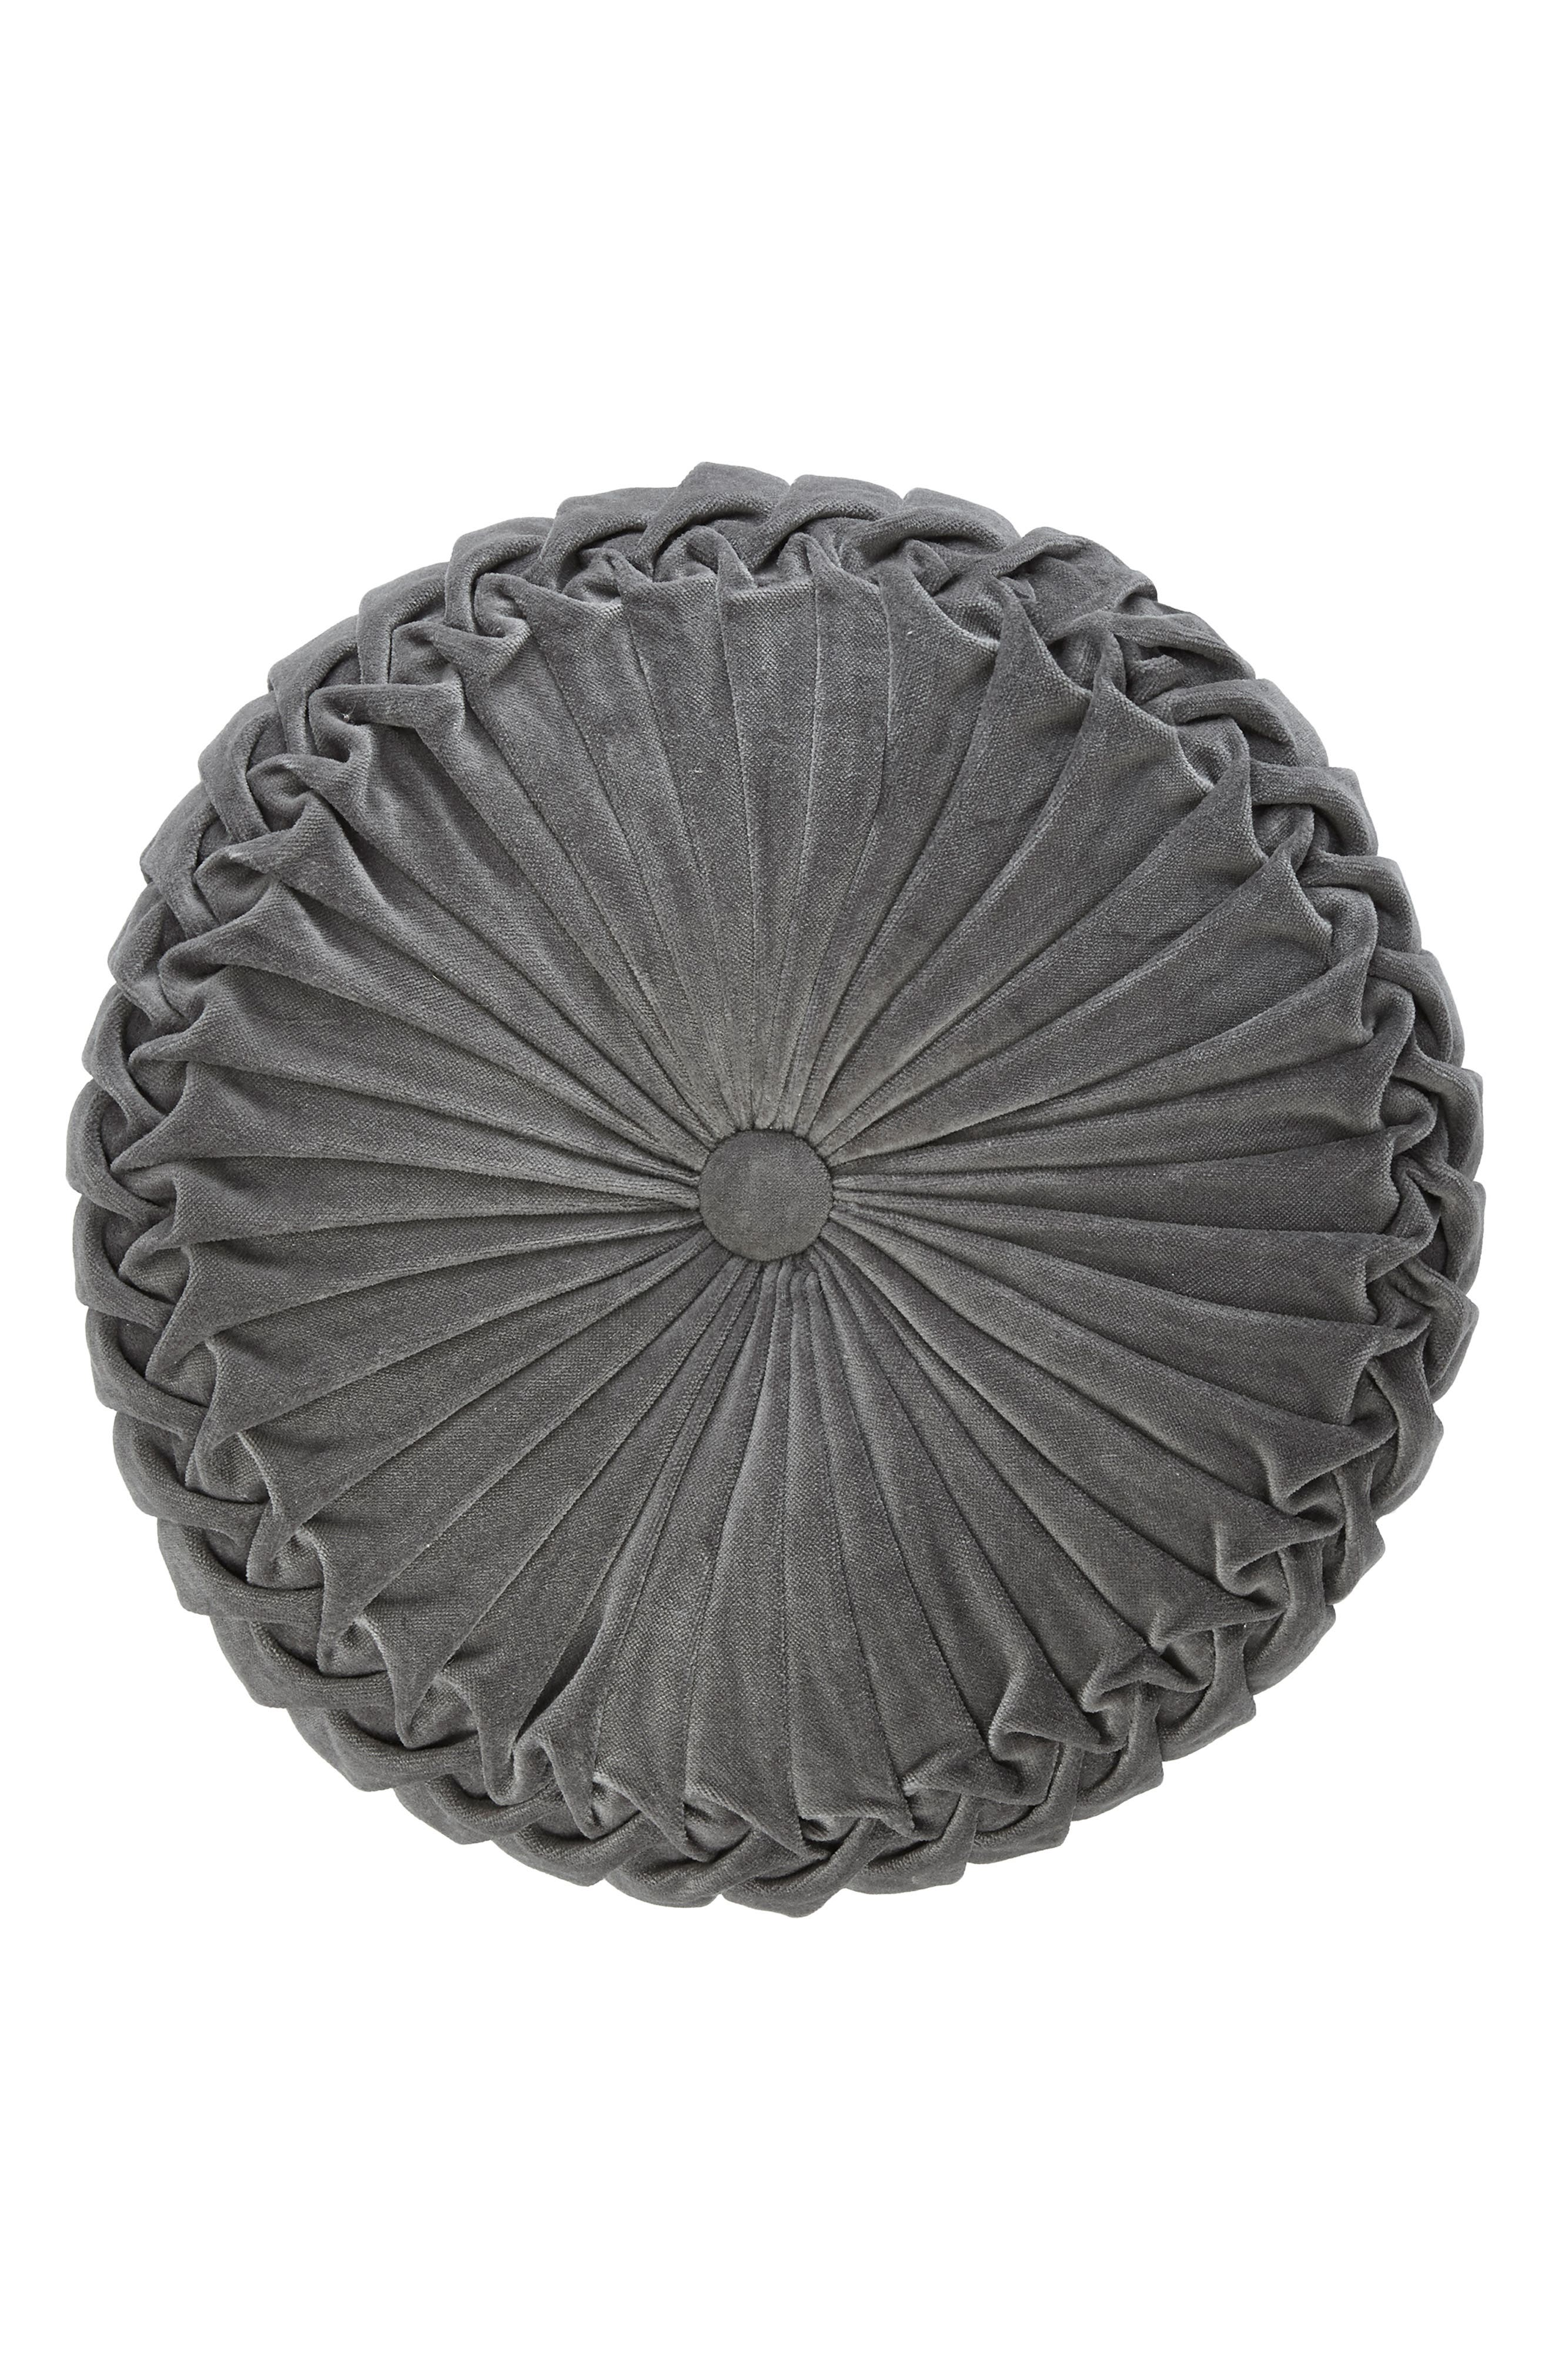 Round Velvet Accent Pillow,                             Main thumbnail 1, color,                             Medium Grey